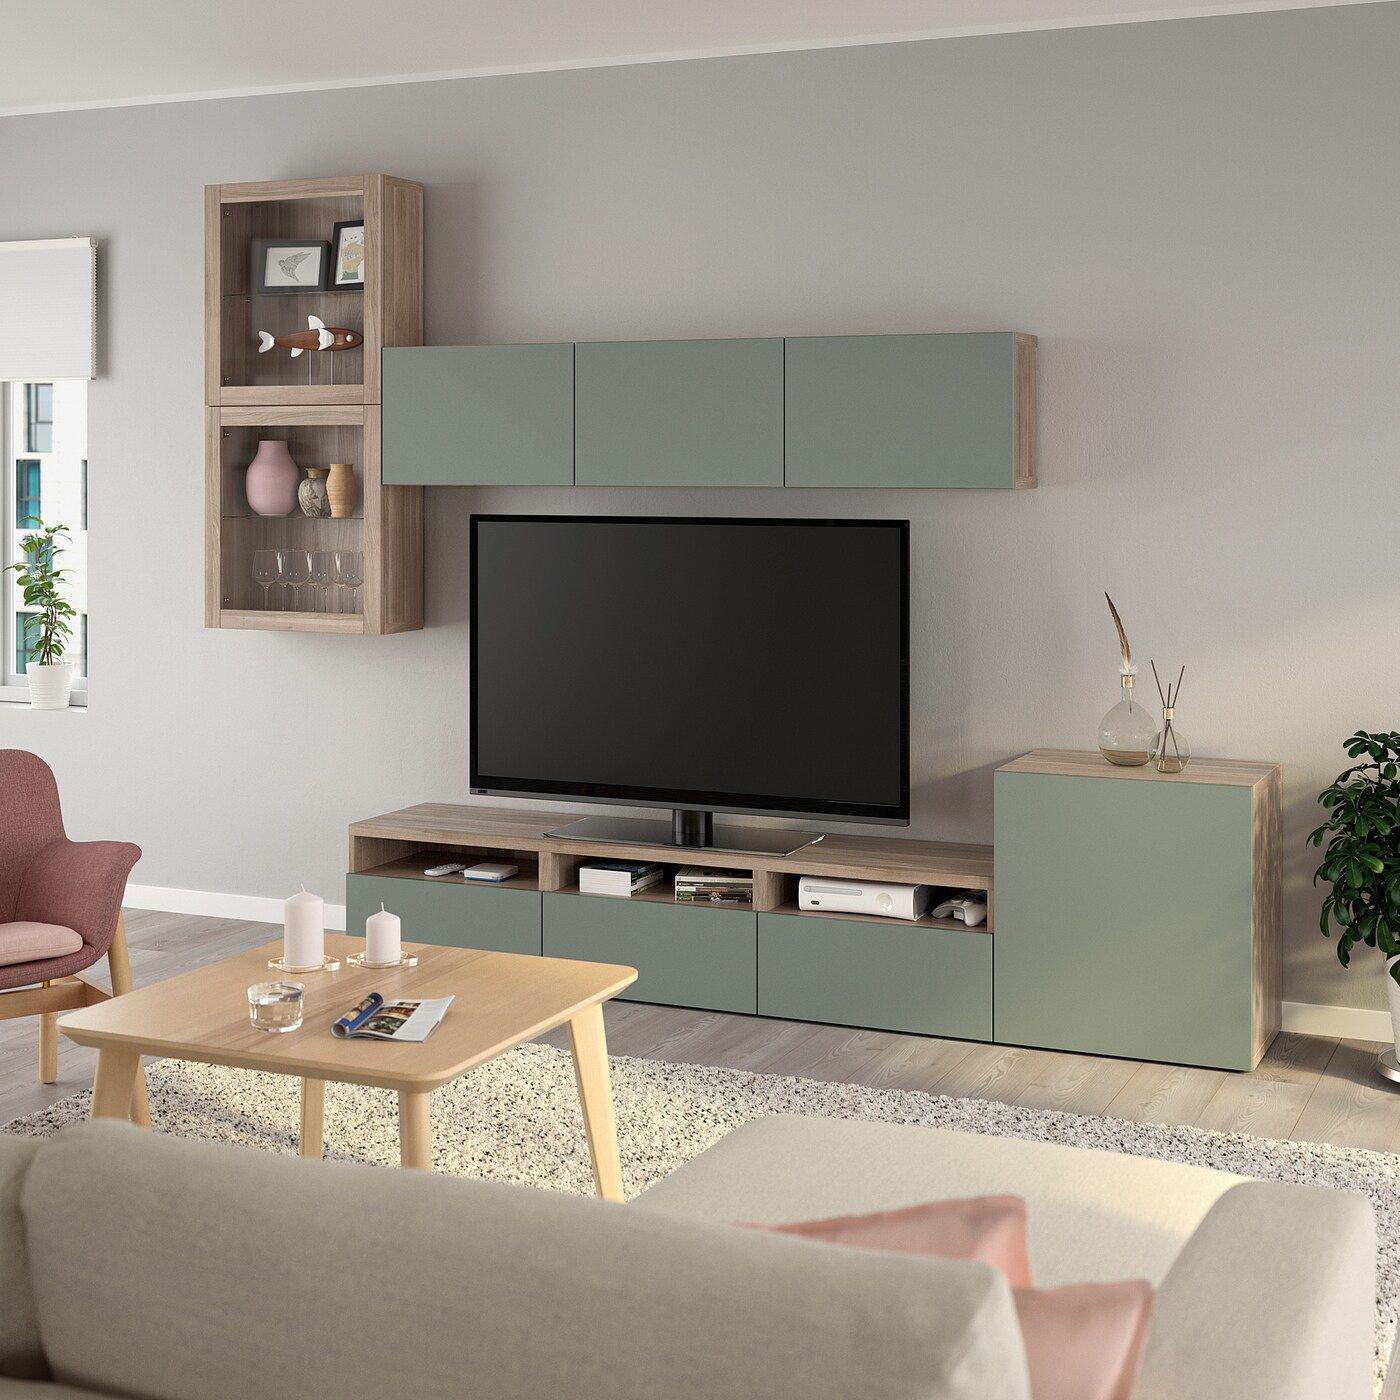 Ikea Besta Agenc Rangt Tele Vitrines Effet Noyer Teinte En 2020 Idee Meuble Tv Meuble Tv Deco Moderne Salon